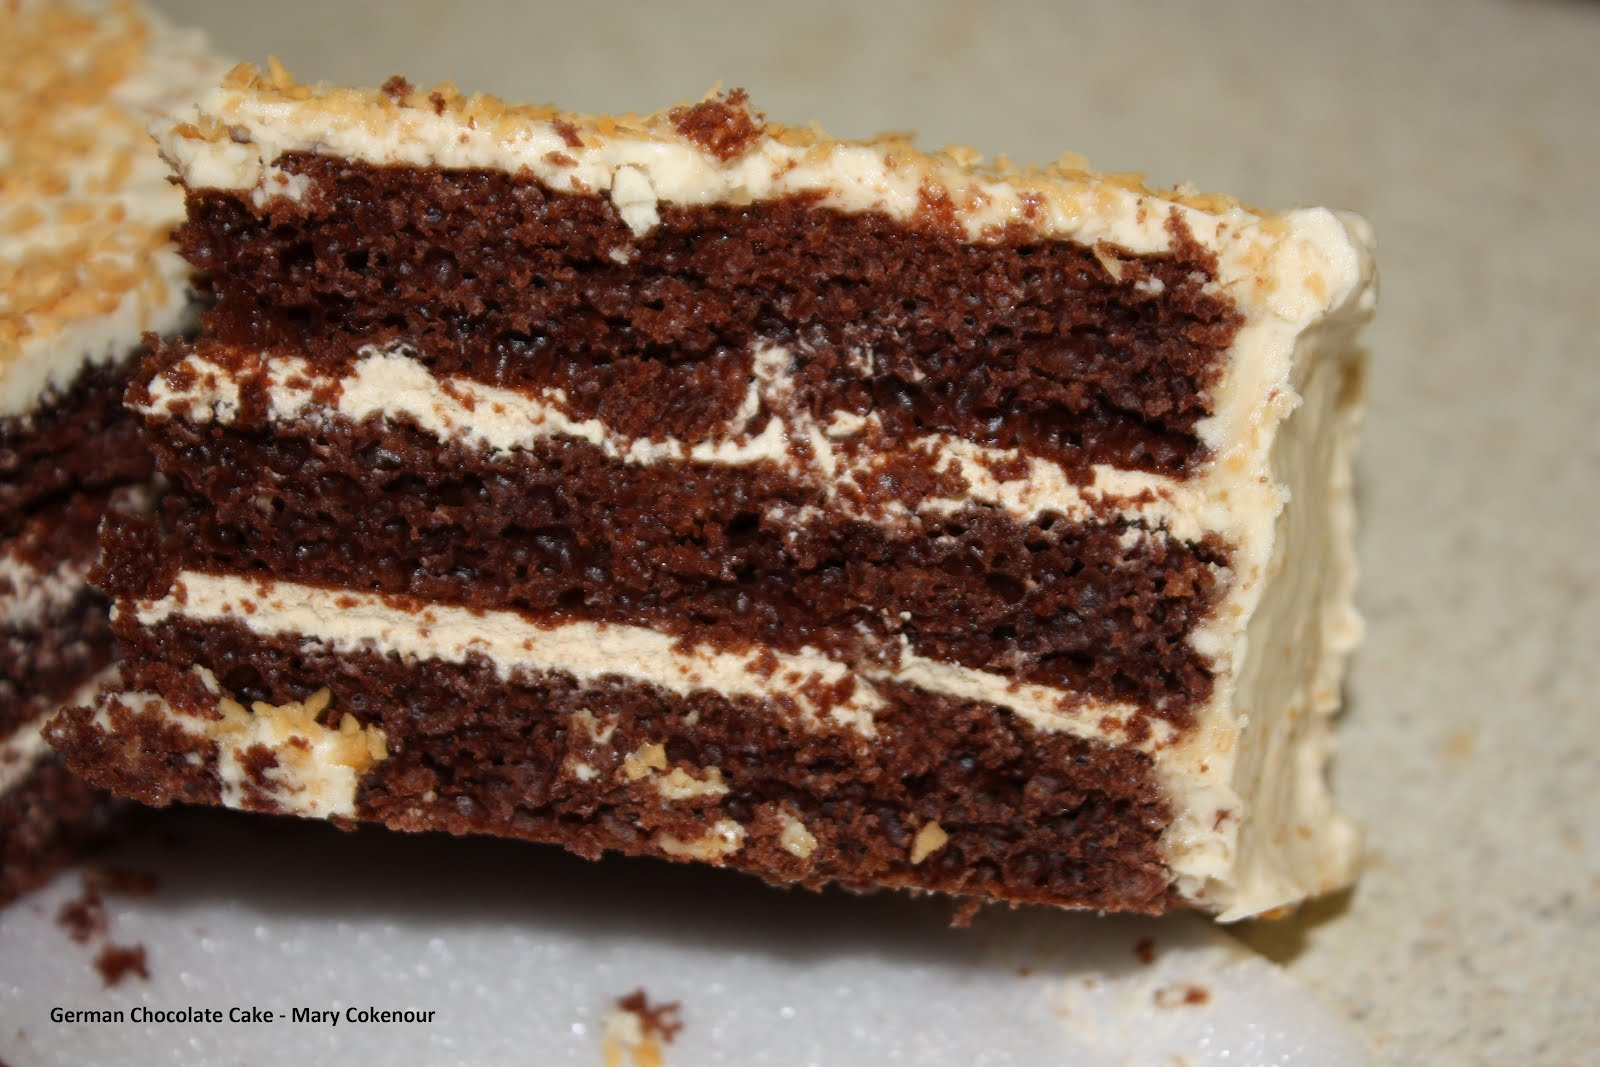 Famous German Chocolate Cake Recipe